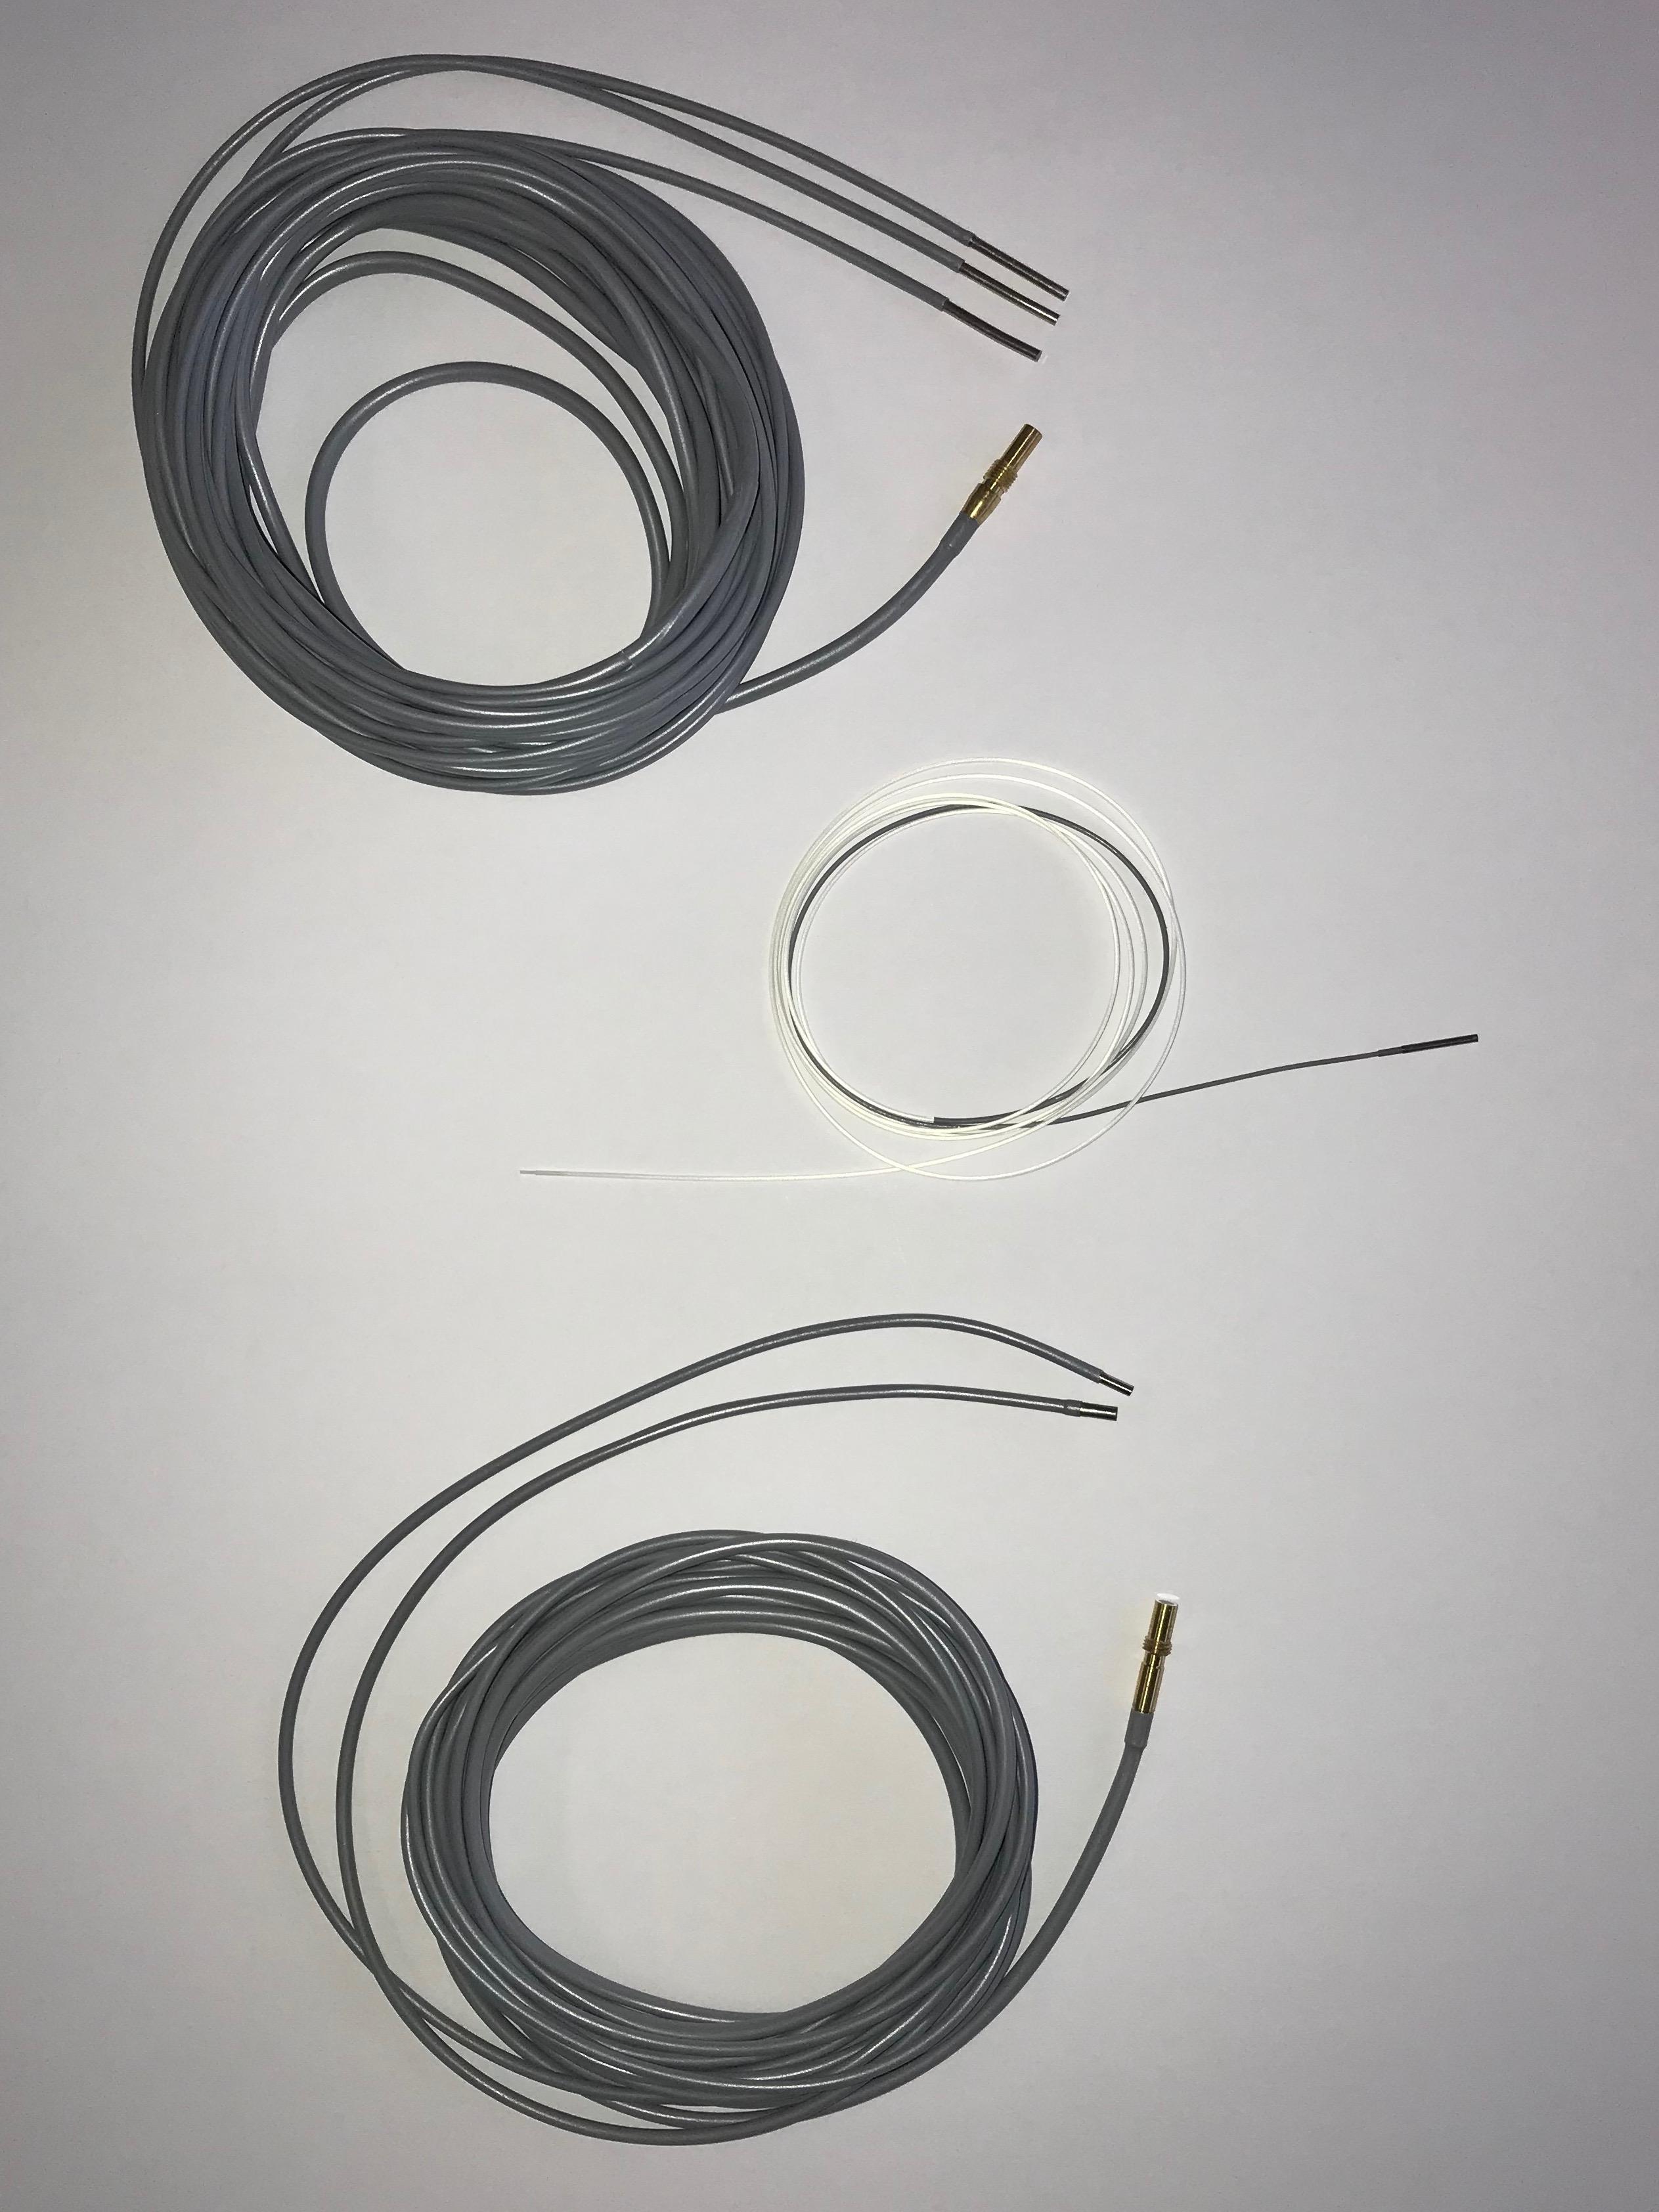 Fiber bundles